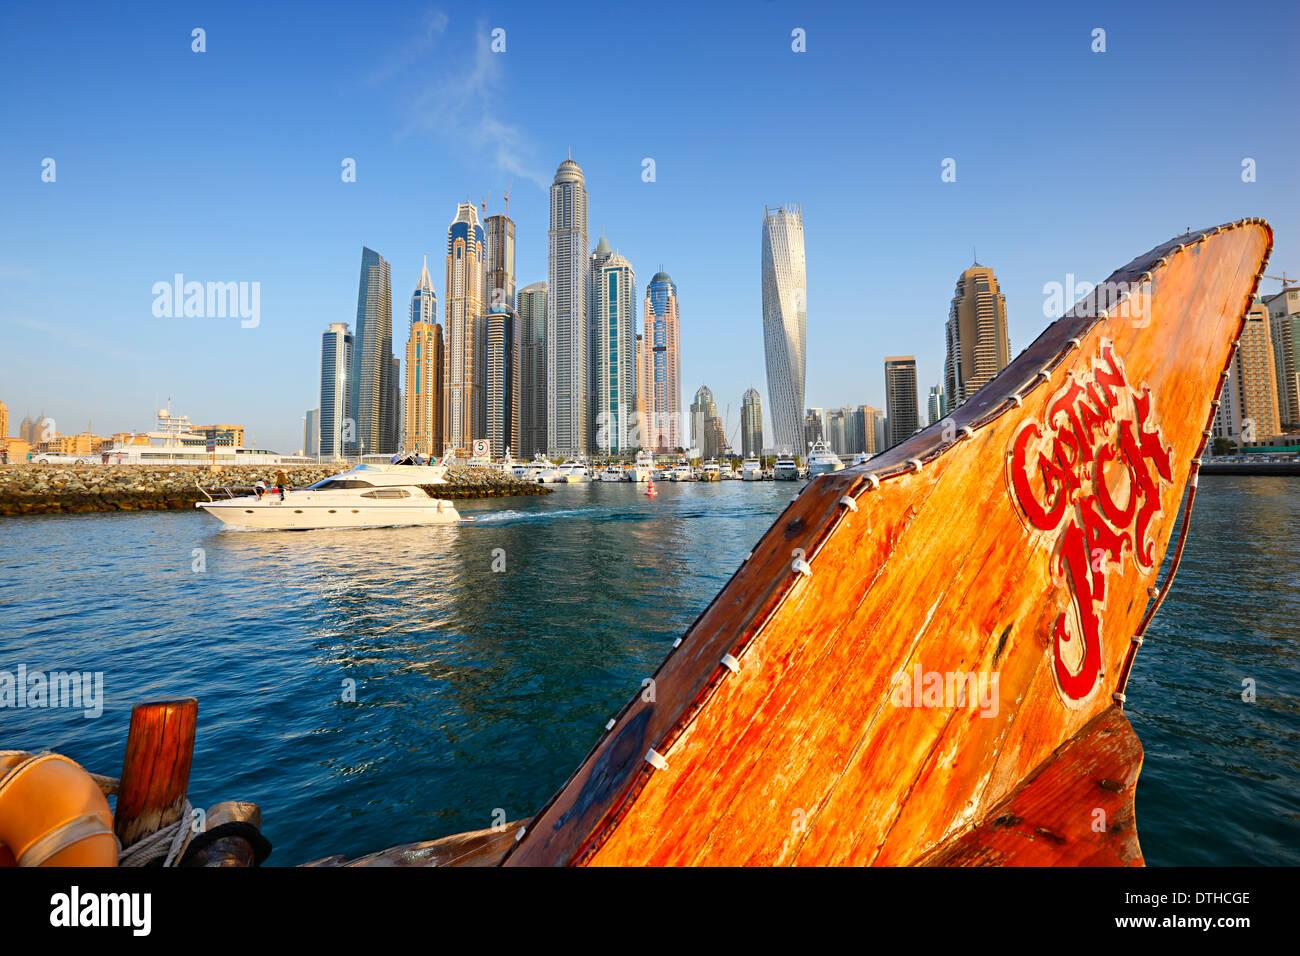 Dubai dhow boat, Marina - Stock Image